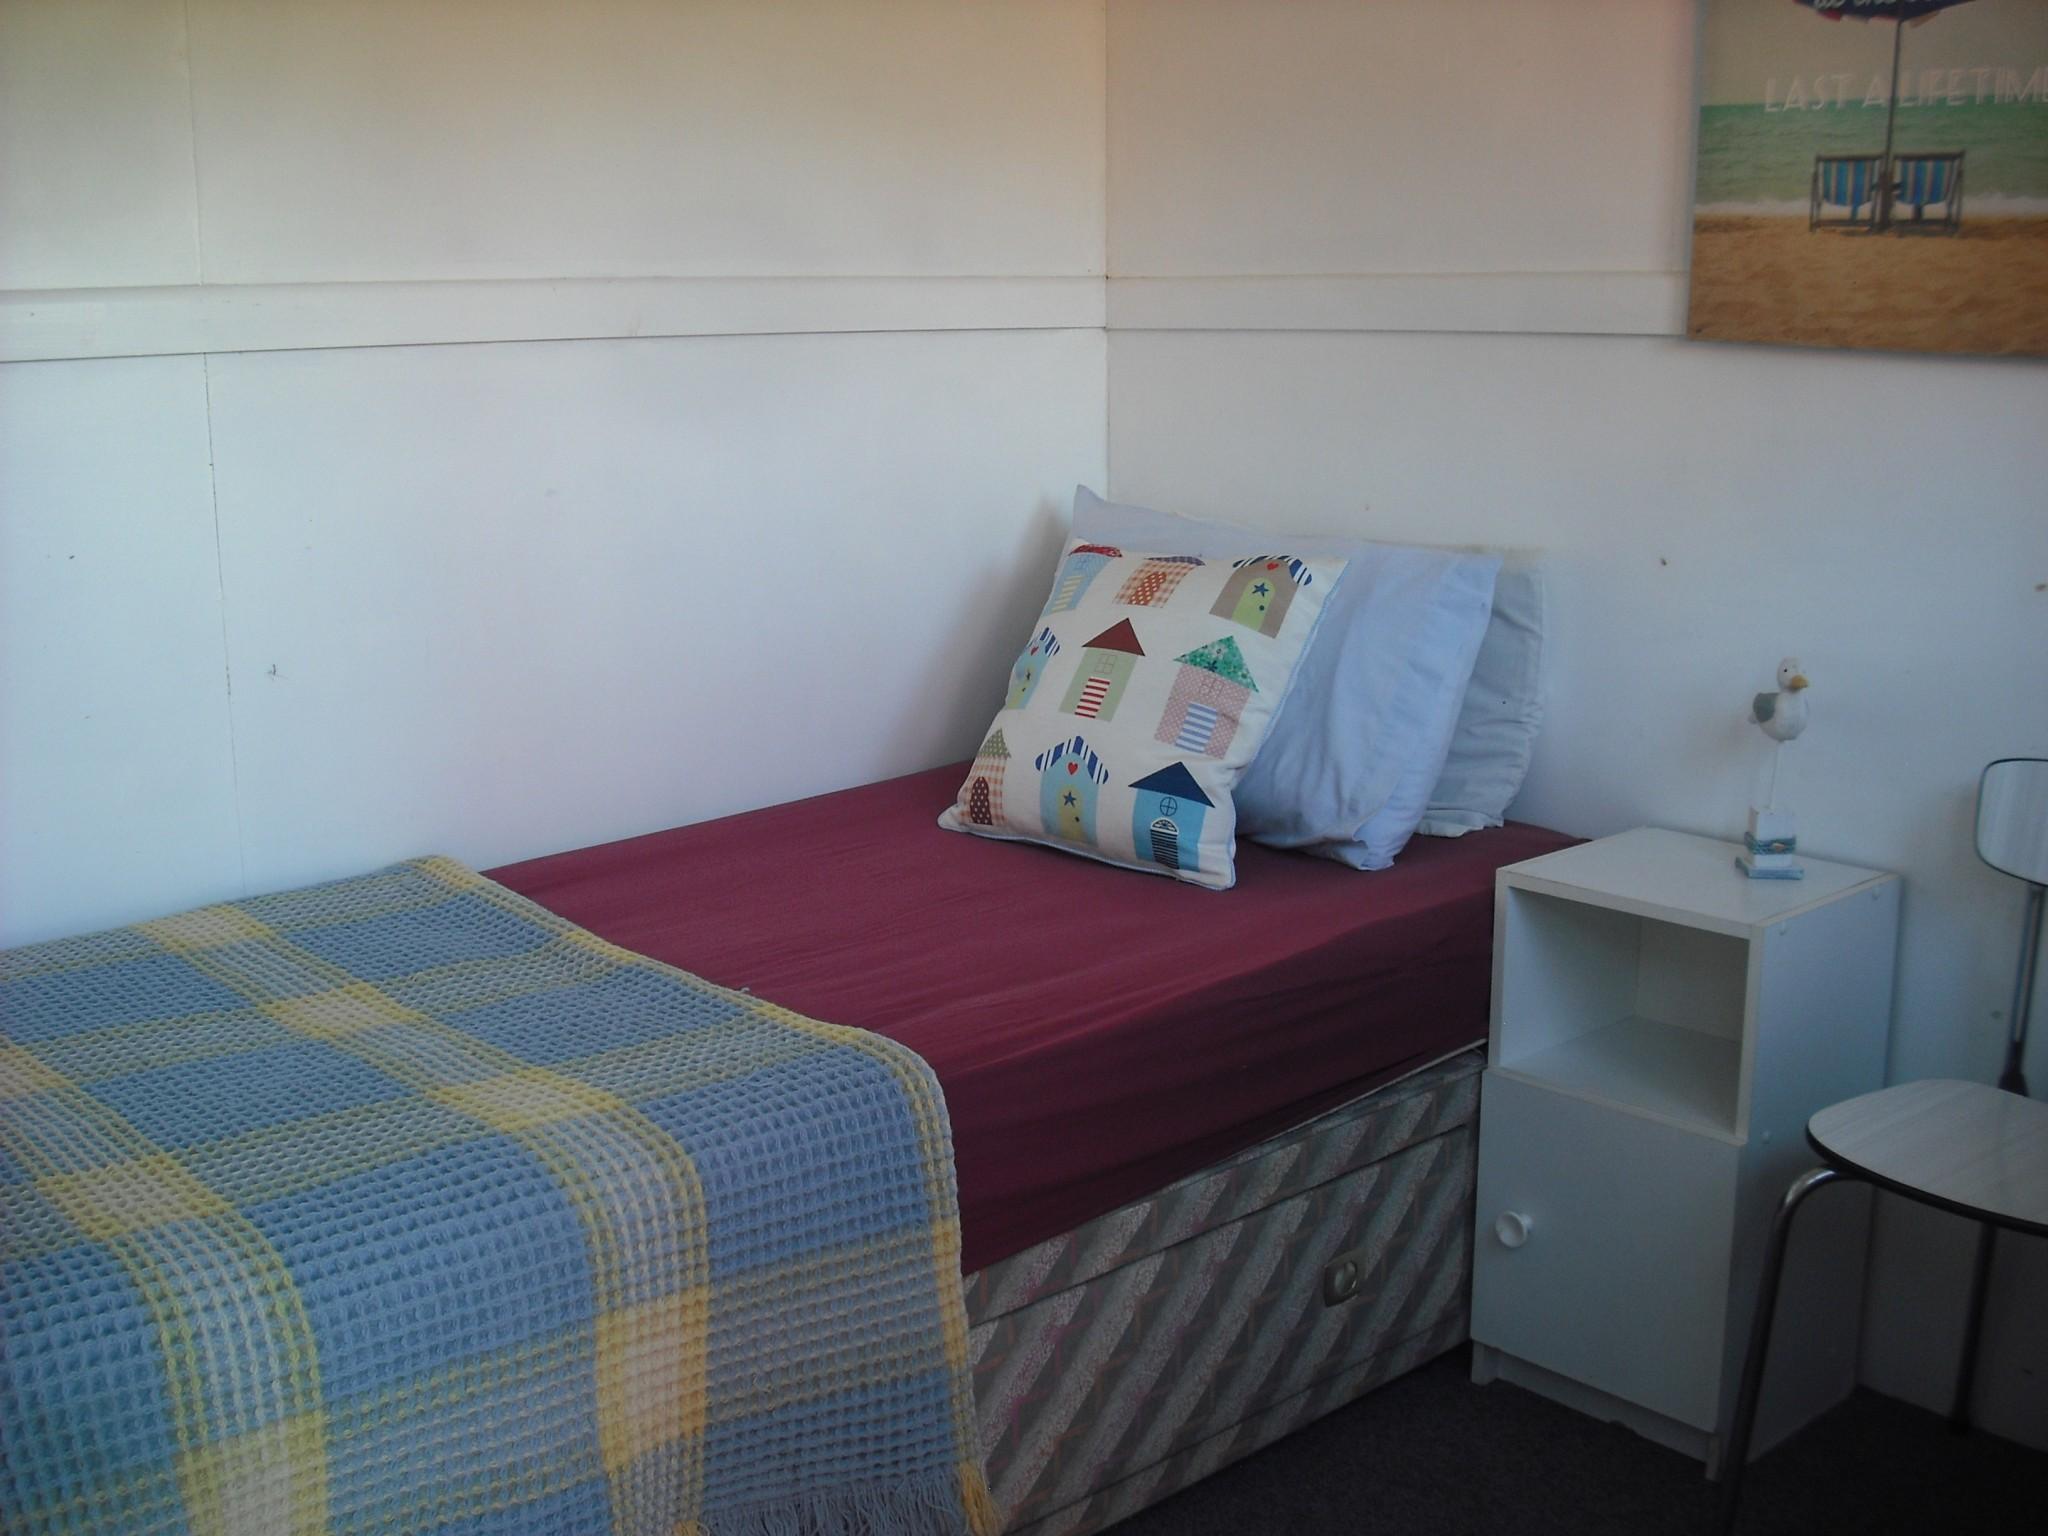 Bed inside Glamping hut